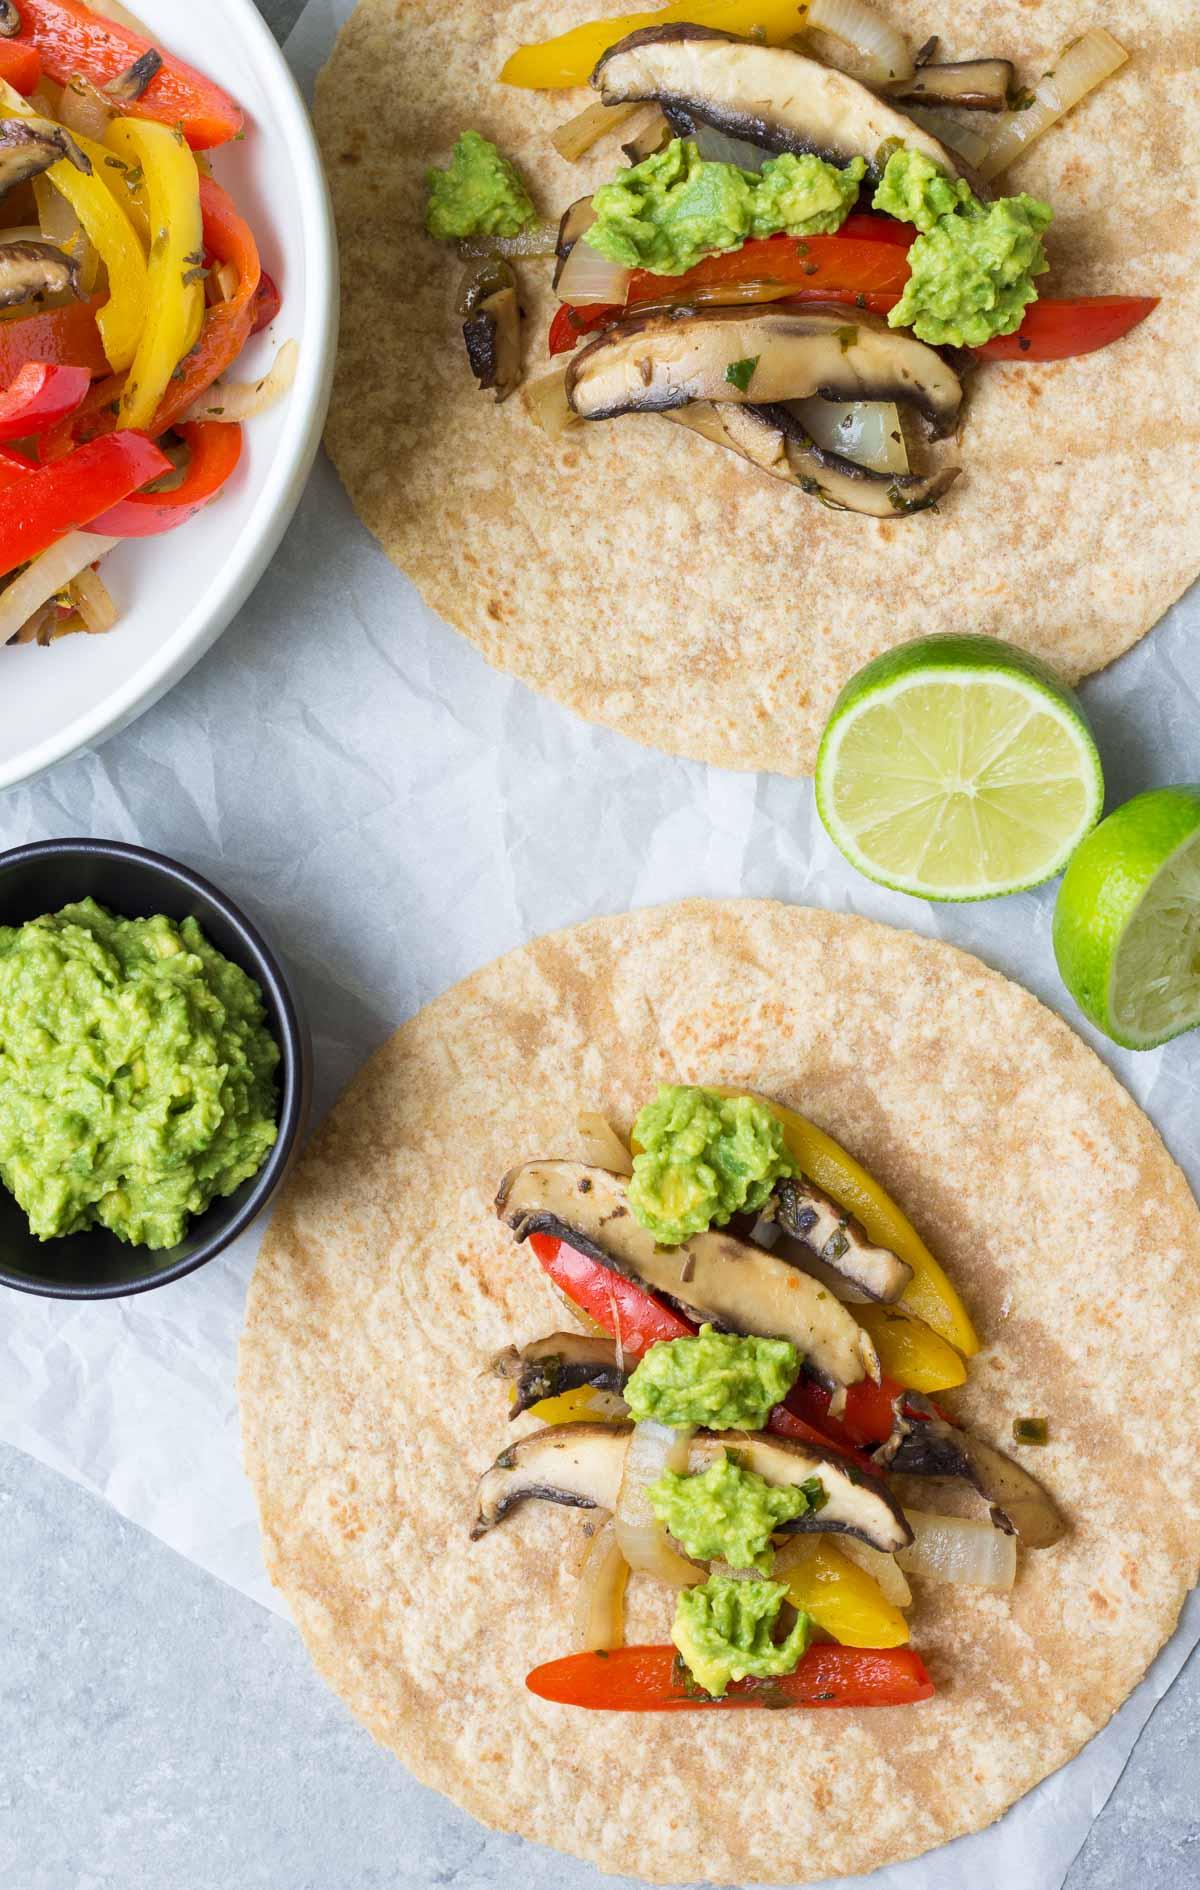 These Vegetarian Portobello Mushroom Fajitas are a 30 minute meal that you can prep ahead. With guacamole, these healthy vegan fajitas are hard to resist! | www.kristineskitchenblog.com